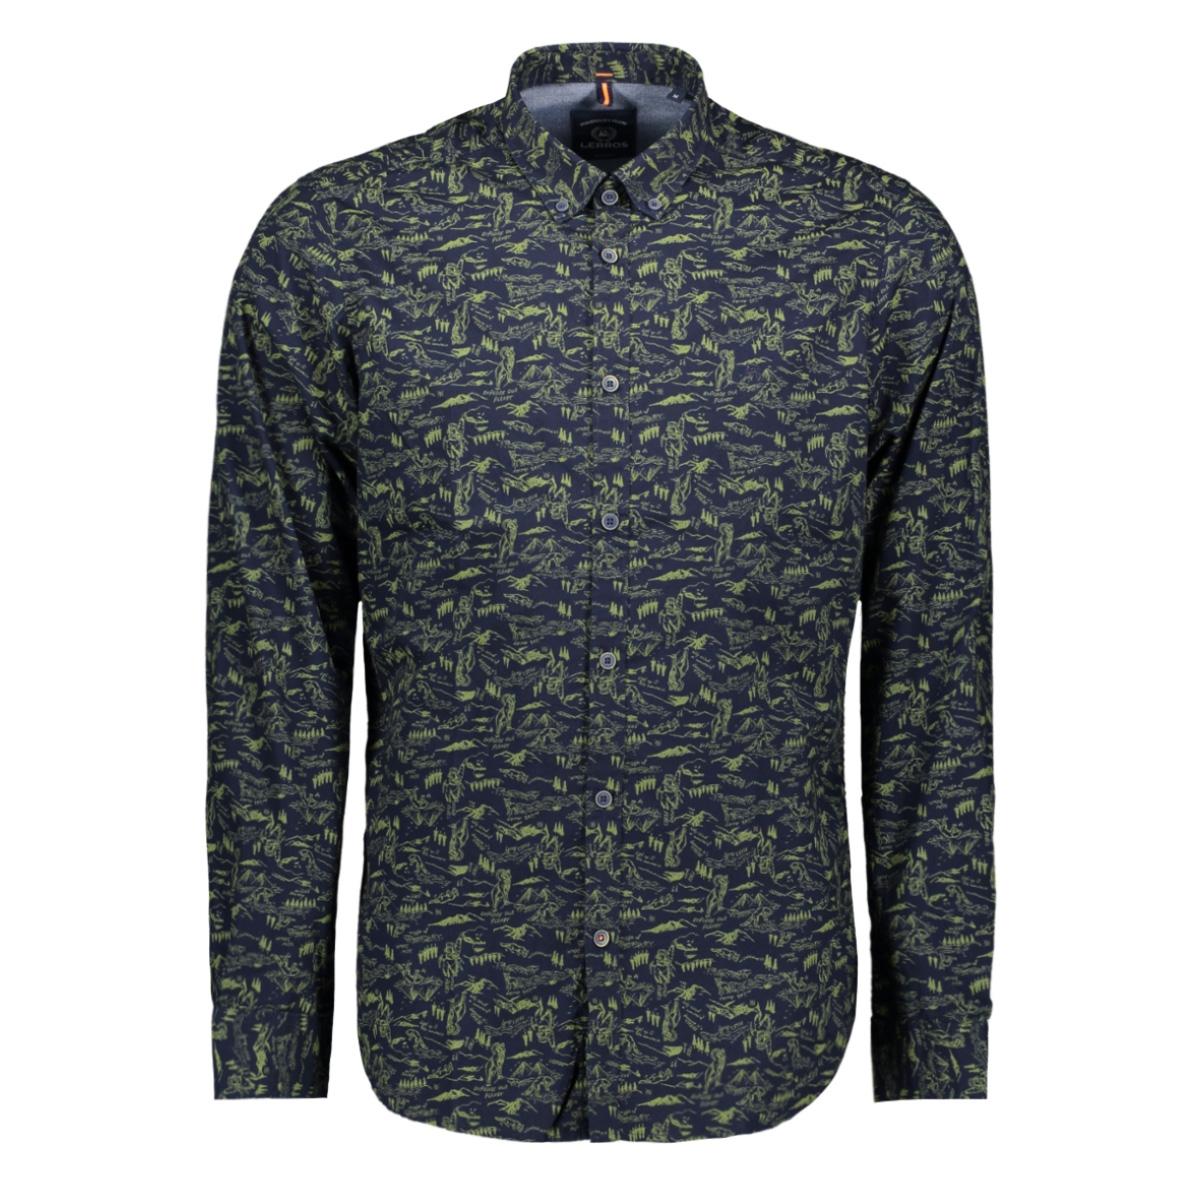 overhemd met all over print 2991159 lerros overhemd 485